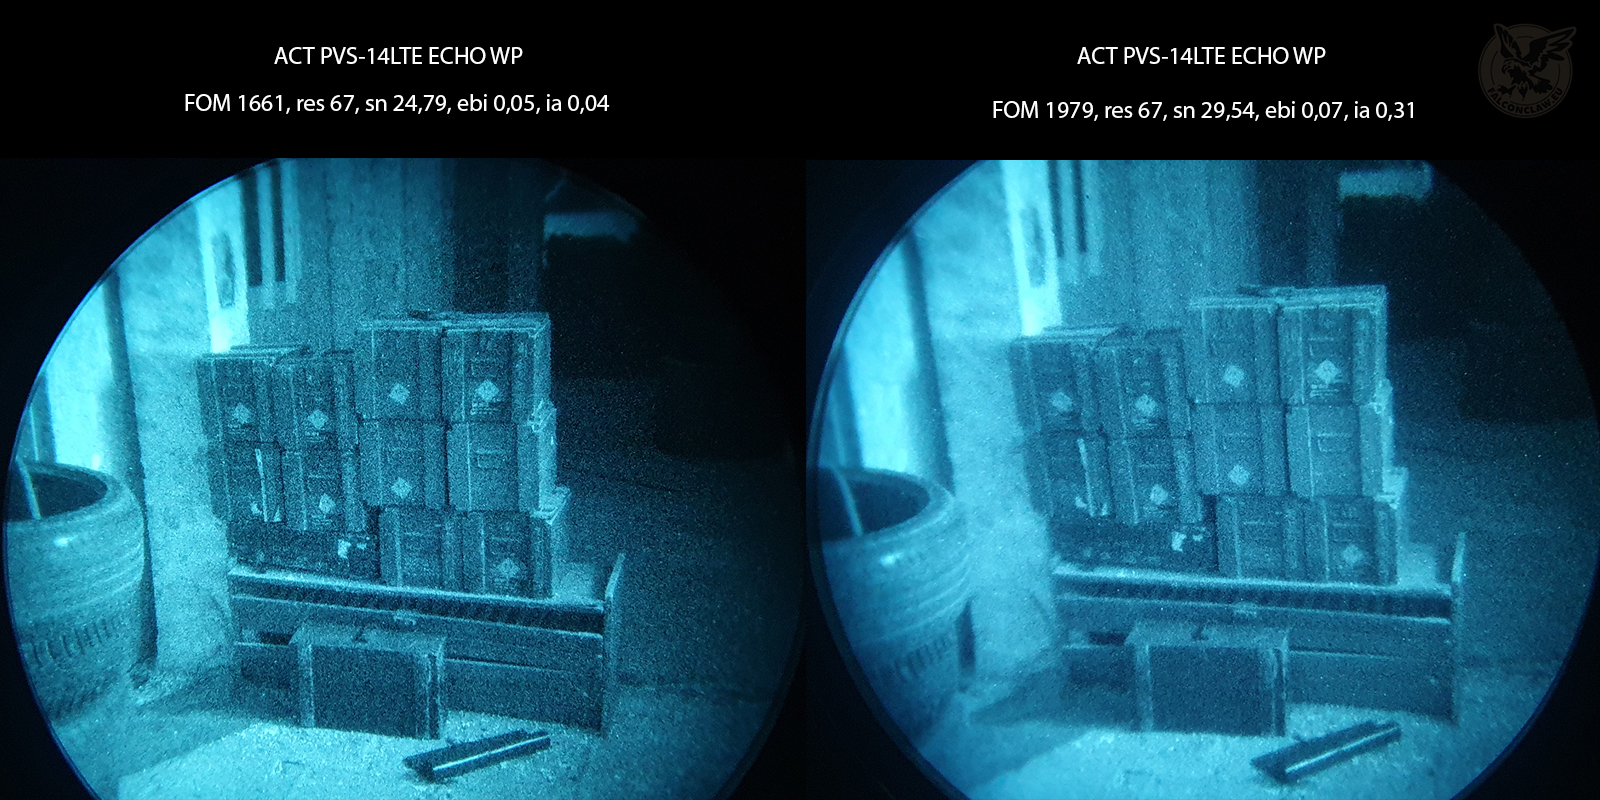 2 comparison JPEG